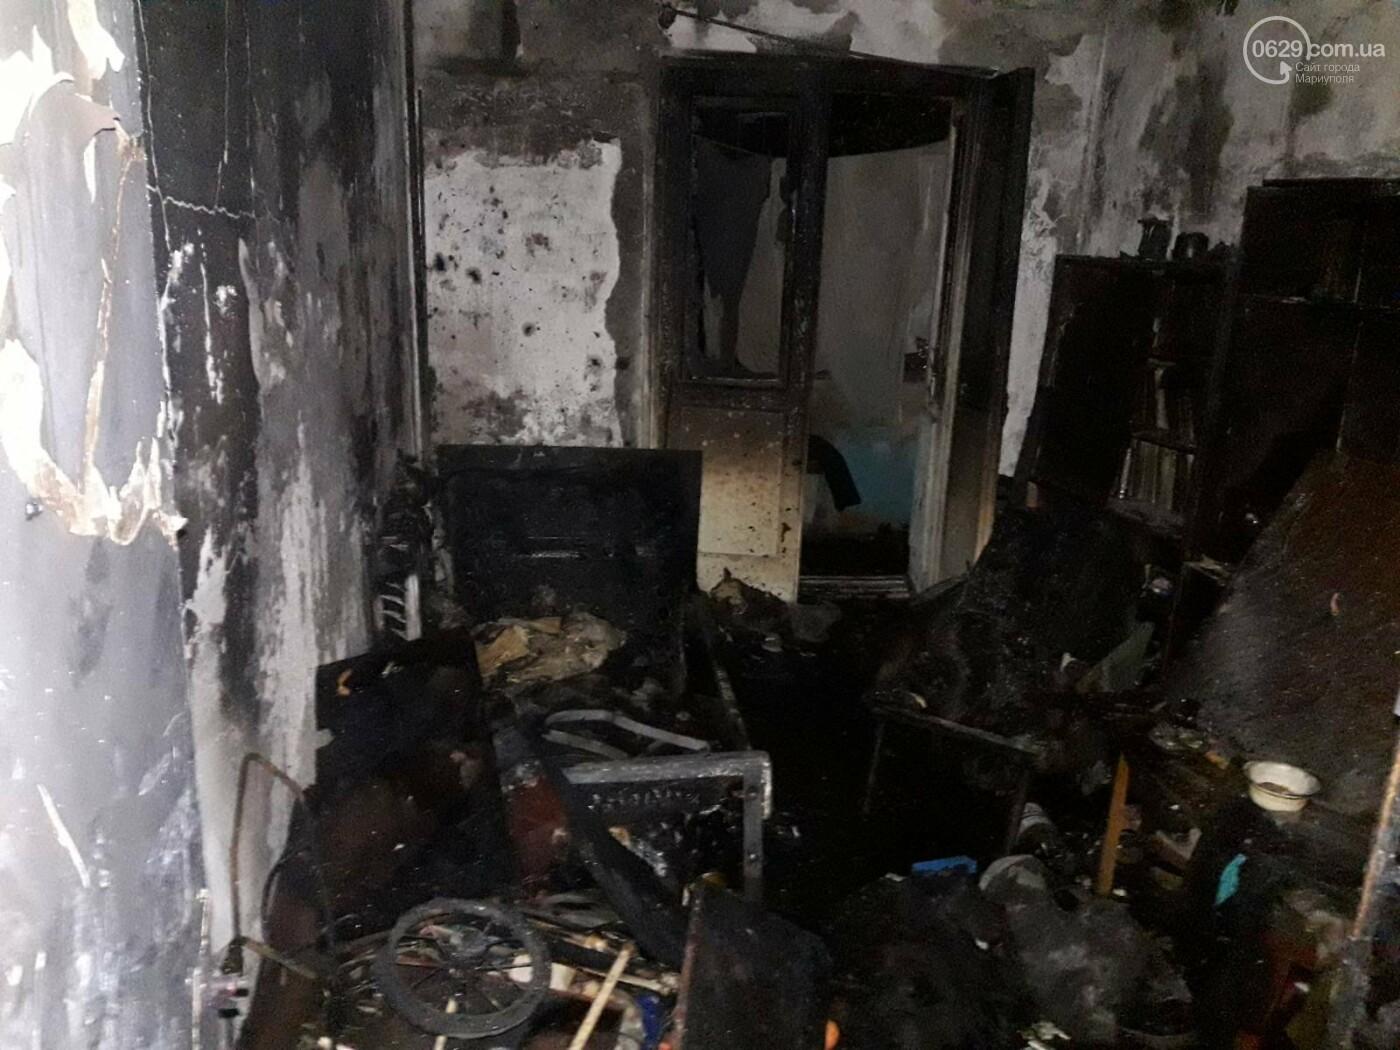 В Мариуполе при пожаре  в девятиэтажке пострадал мужчина, - ФОТО, фото-4